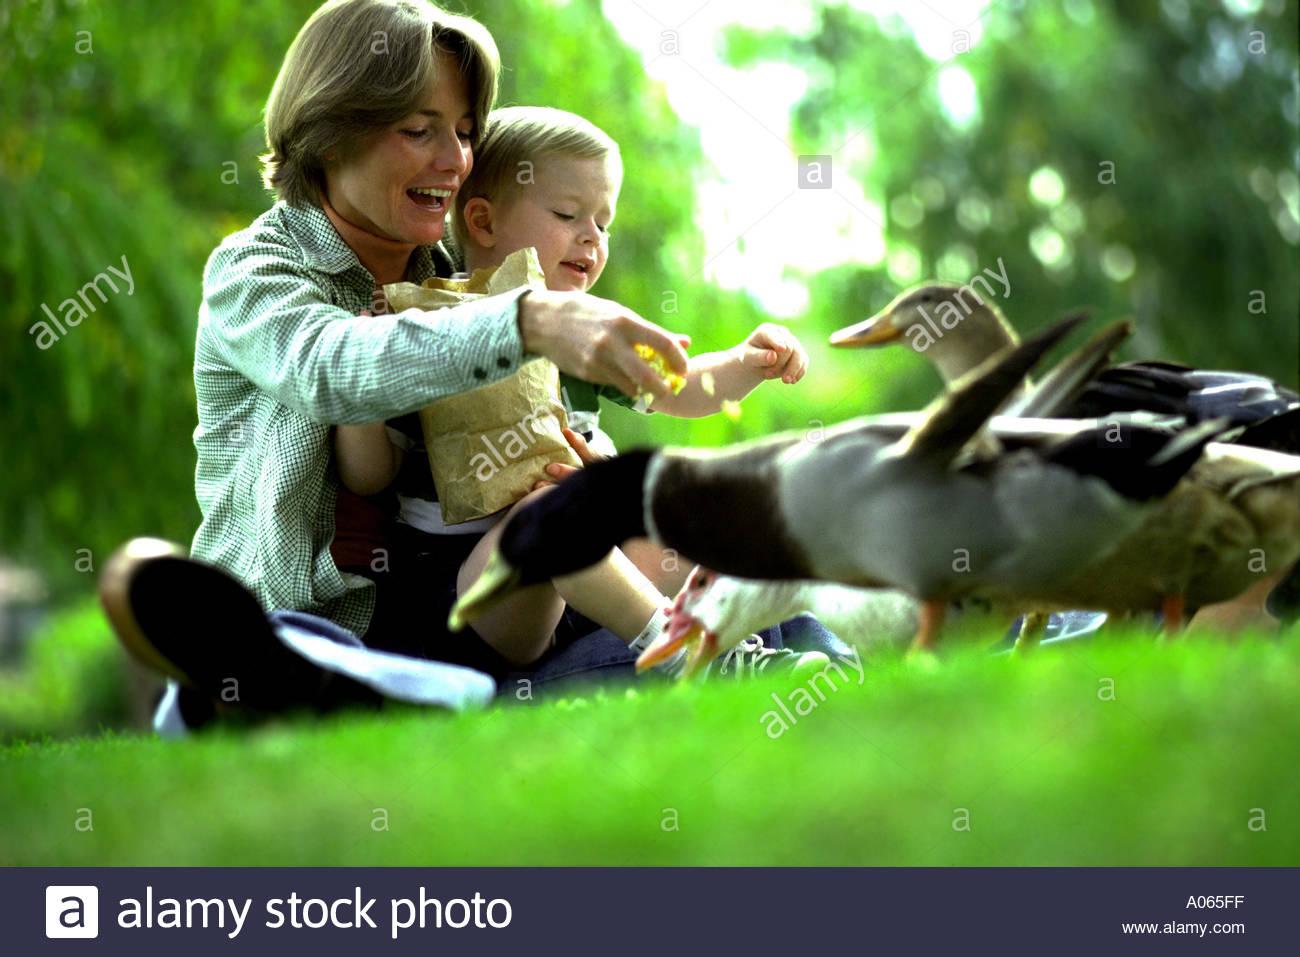 Mom And Son Feeding Ducks Stock Image